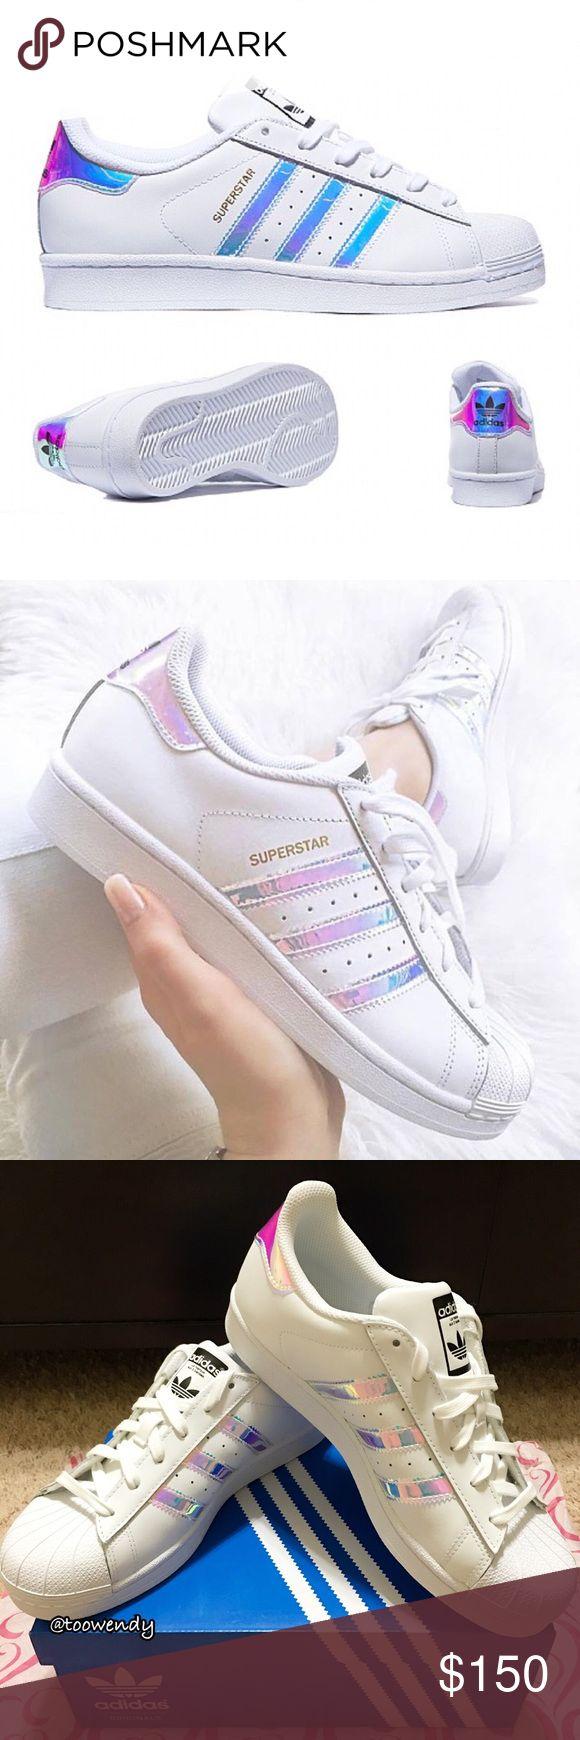 scarpe adidas unicorno